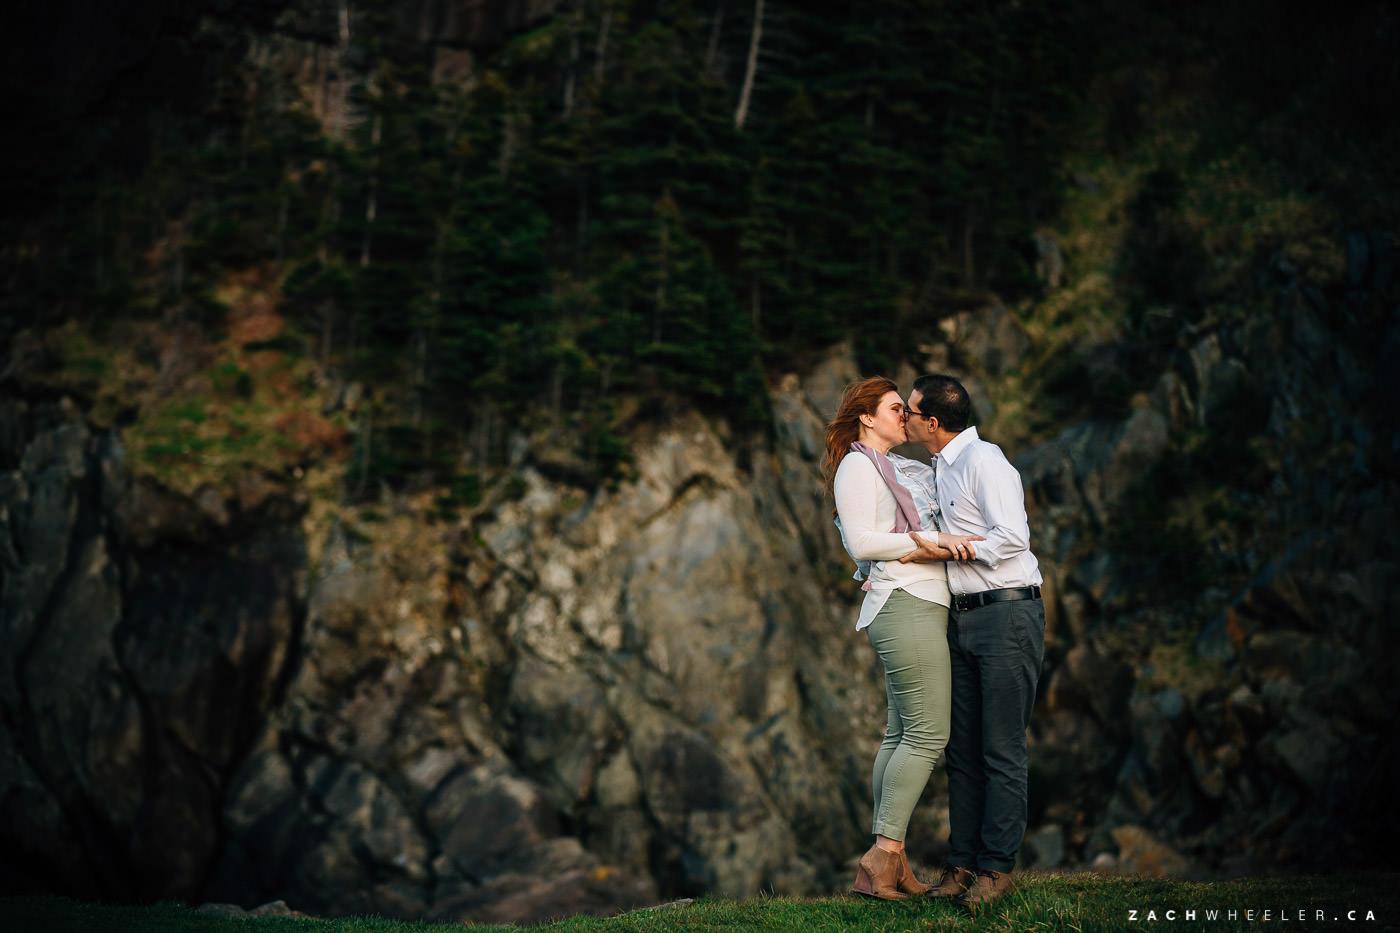 Kim-Dan-Engagement-Photography-StJohns-Newfoundland-10